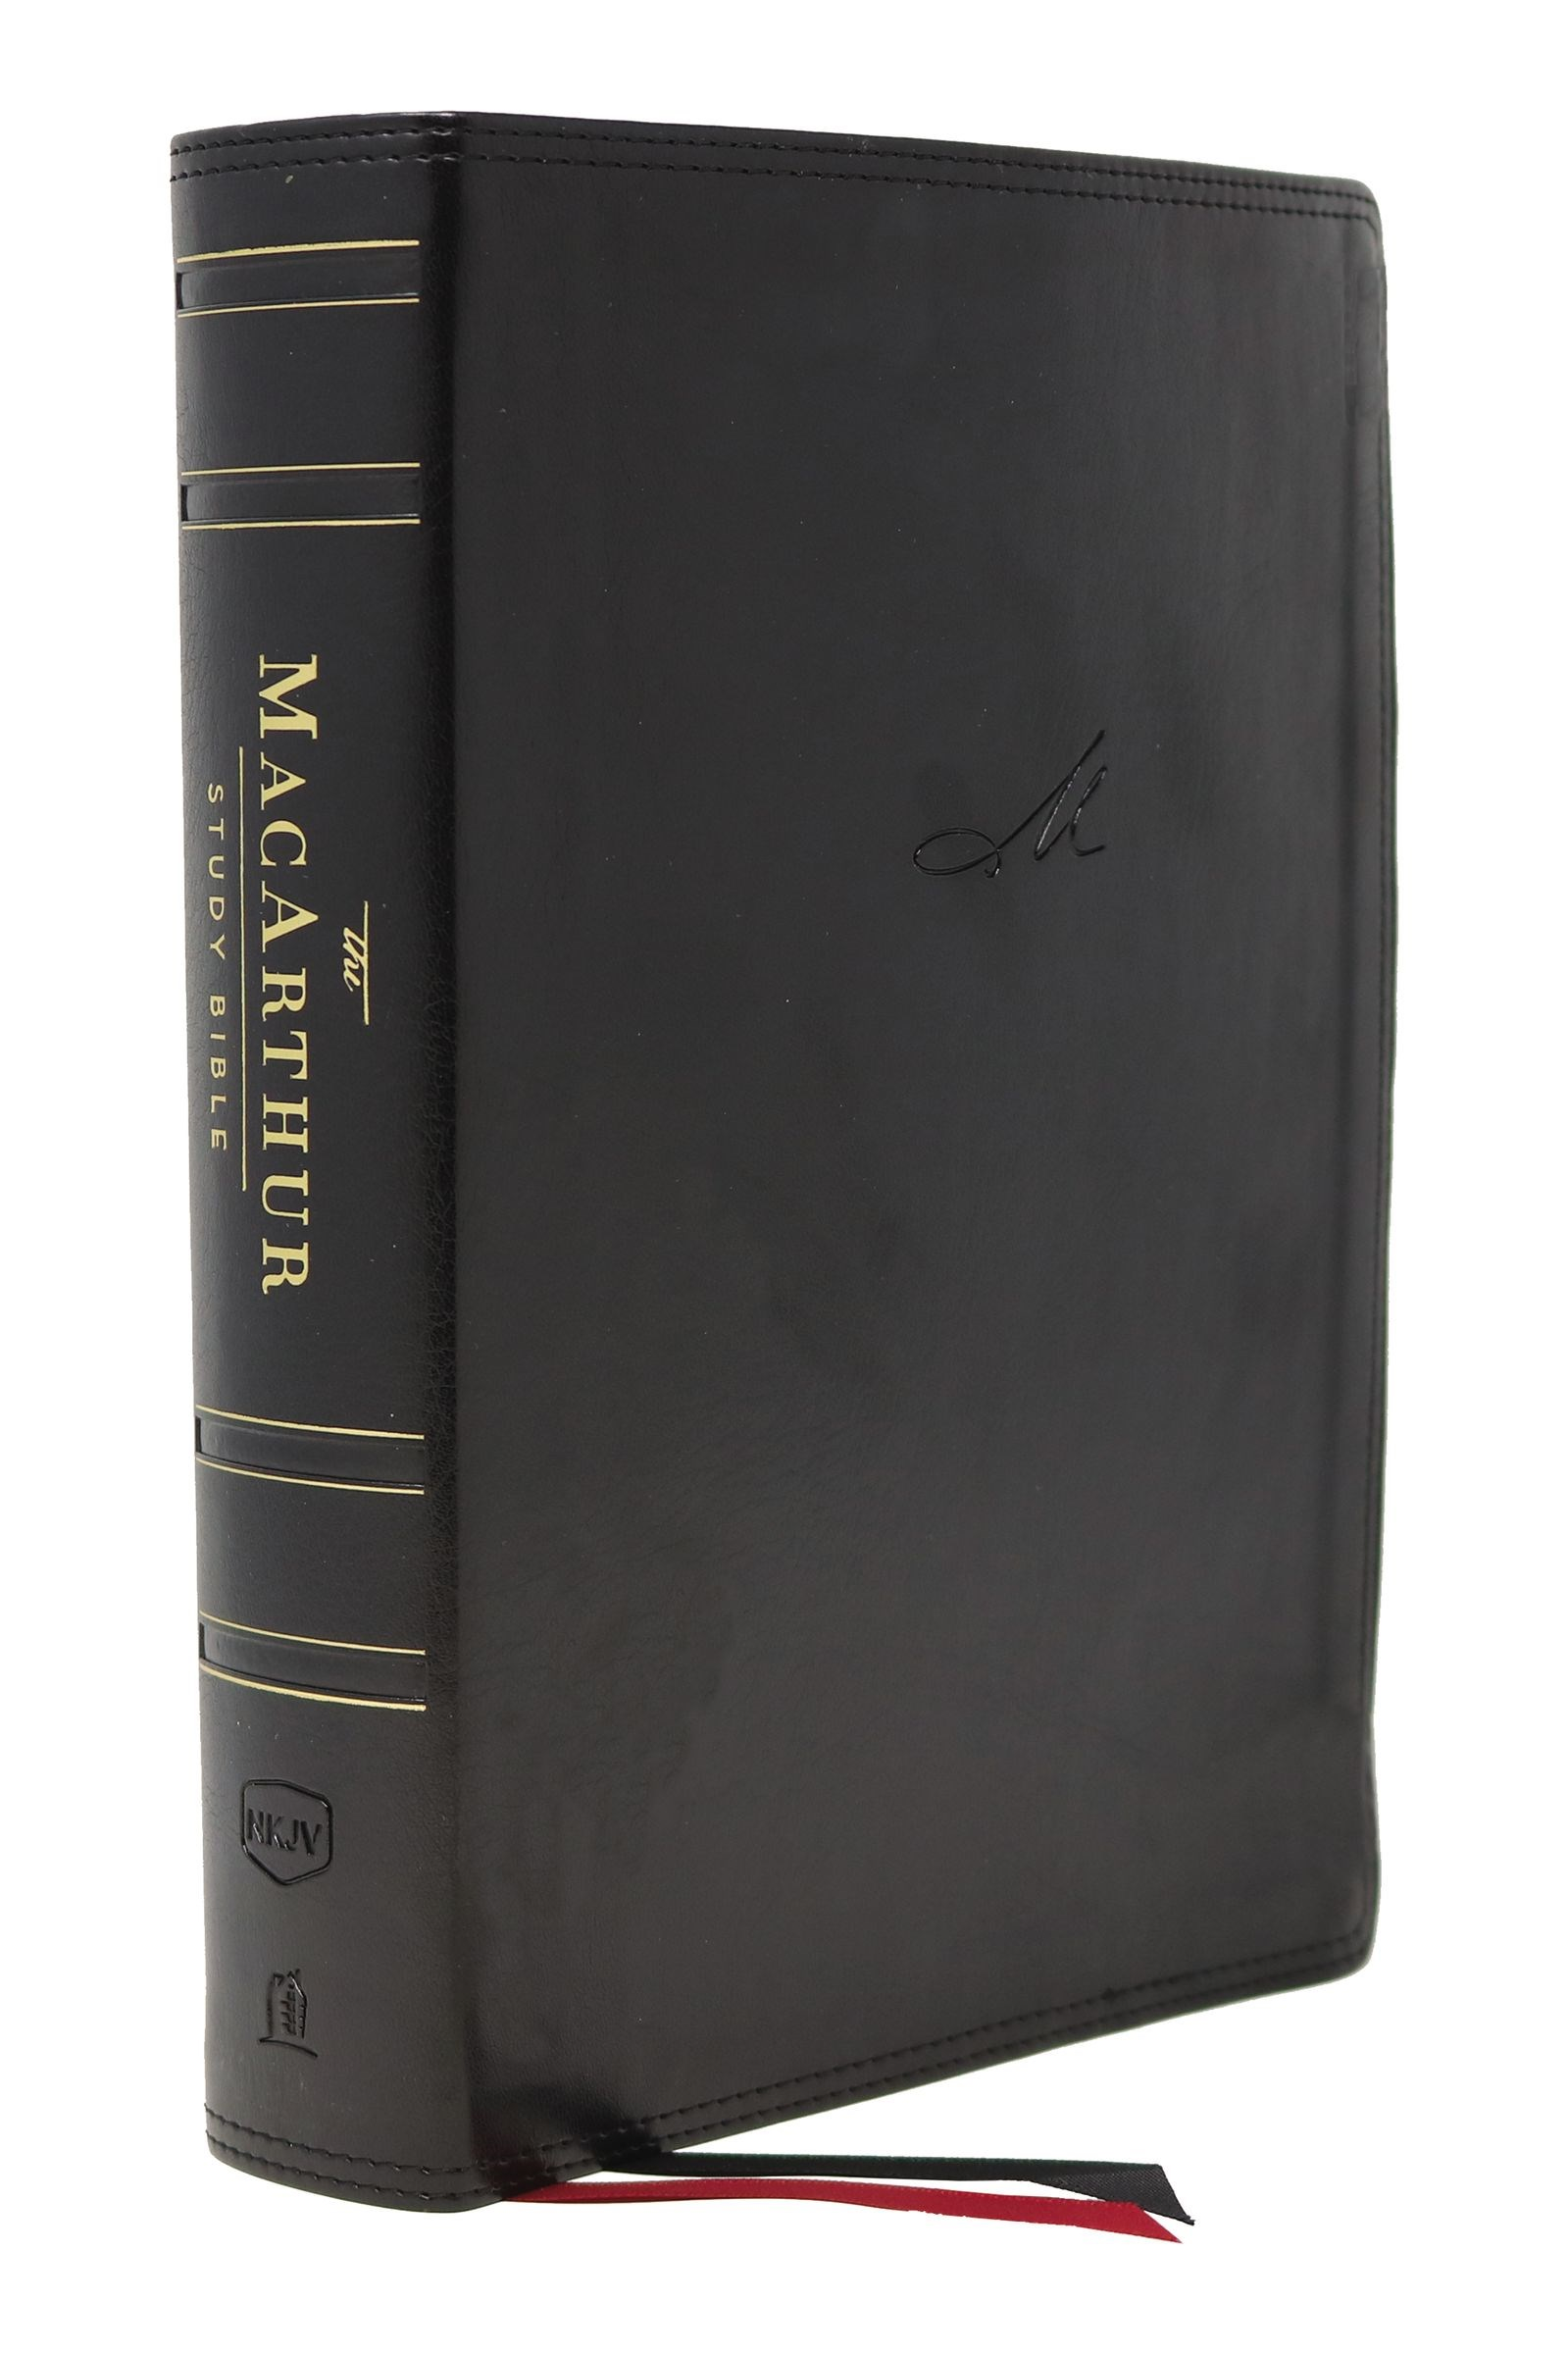 NKJV MacArthur Study Bible (2nd Edition) (Comfort Print)-Black Leathersoft